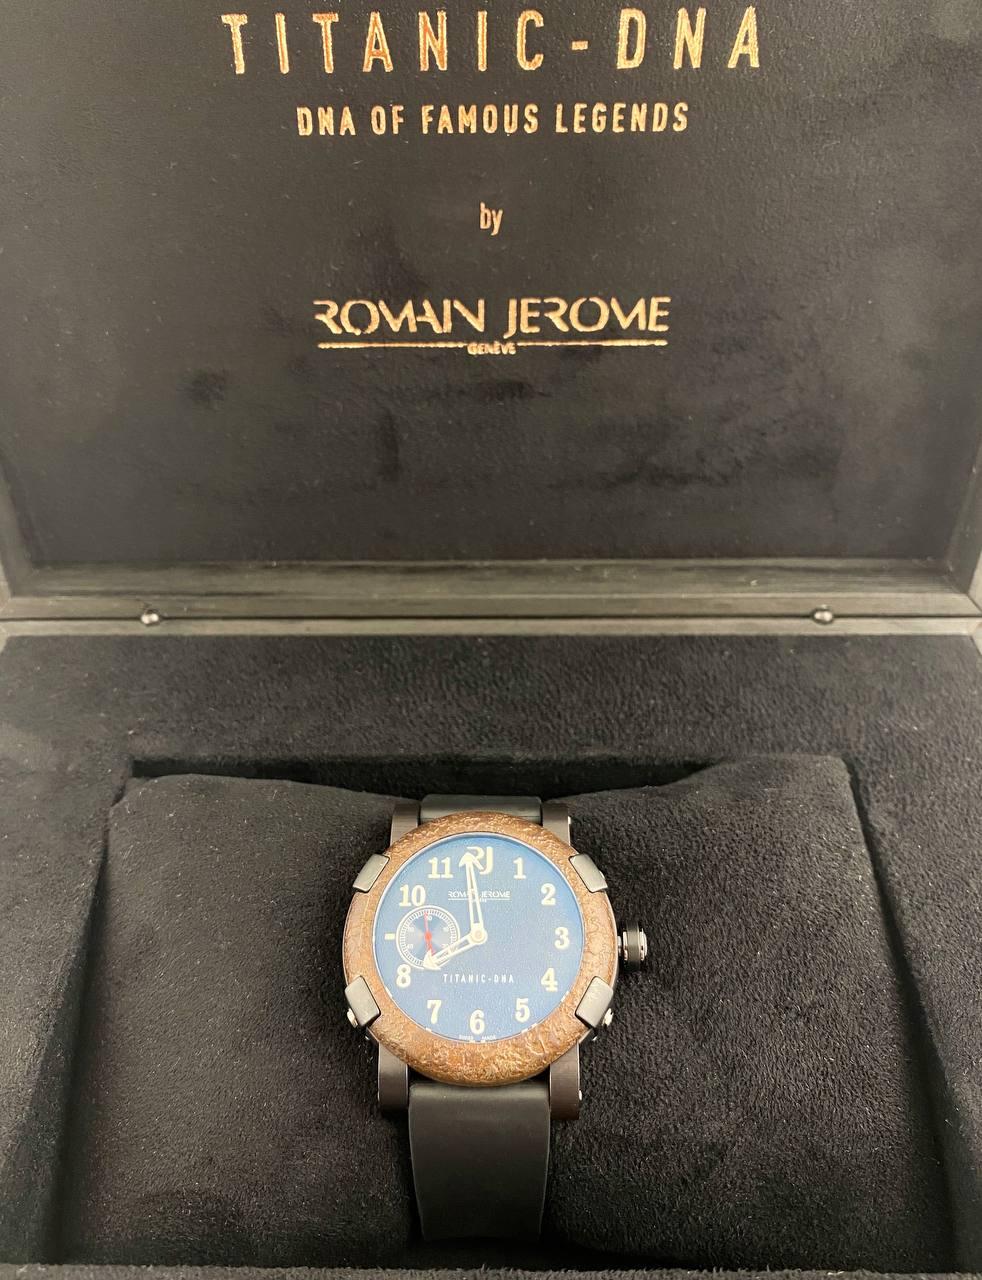 Часы Romain Jerome Titanic - DNA T.0XY3.BBBB.00